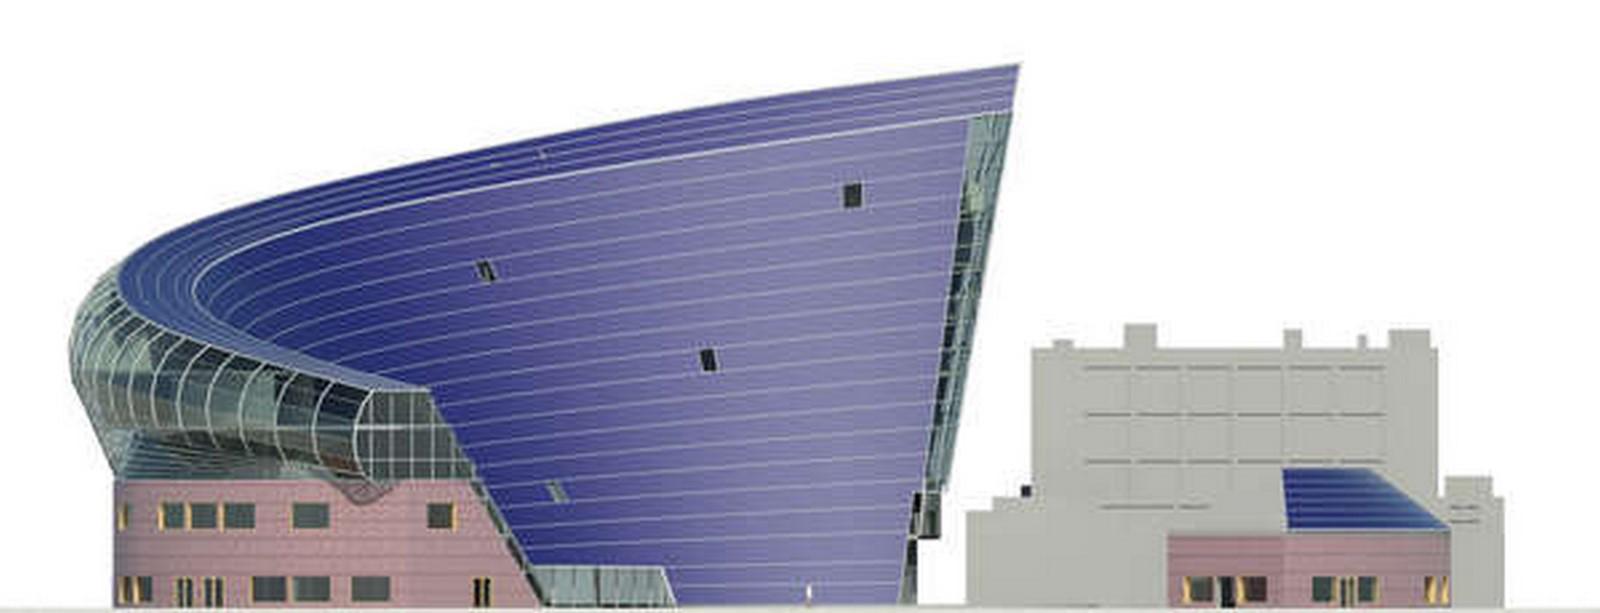 Sculpting a Futuristic Utopia of Architecture? Sheet6